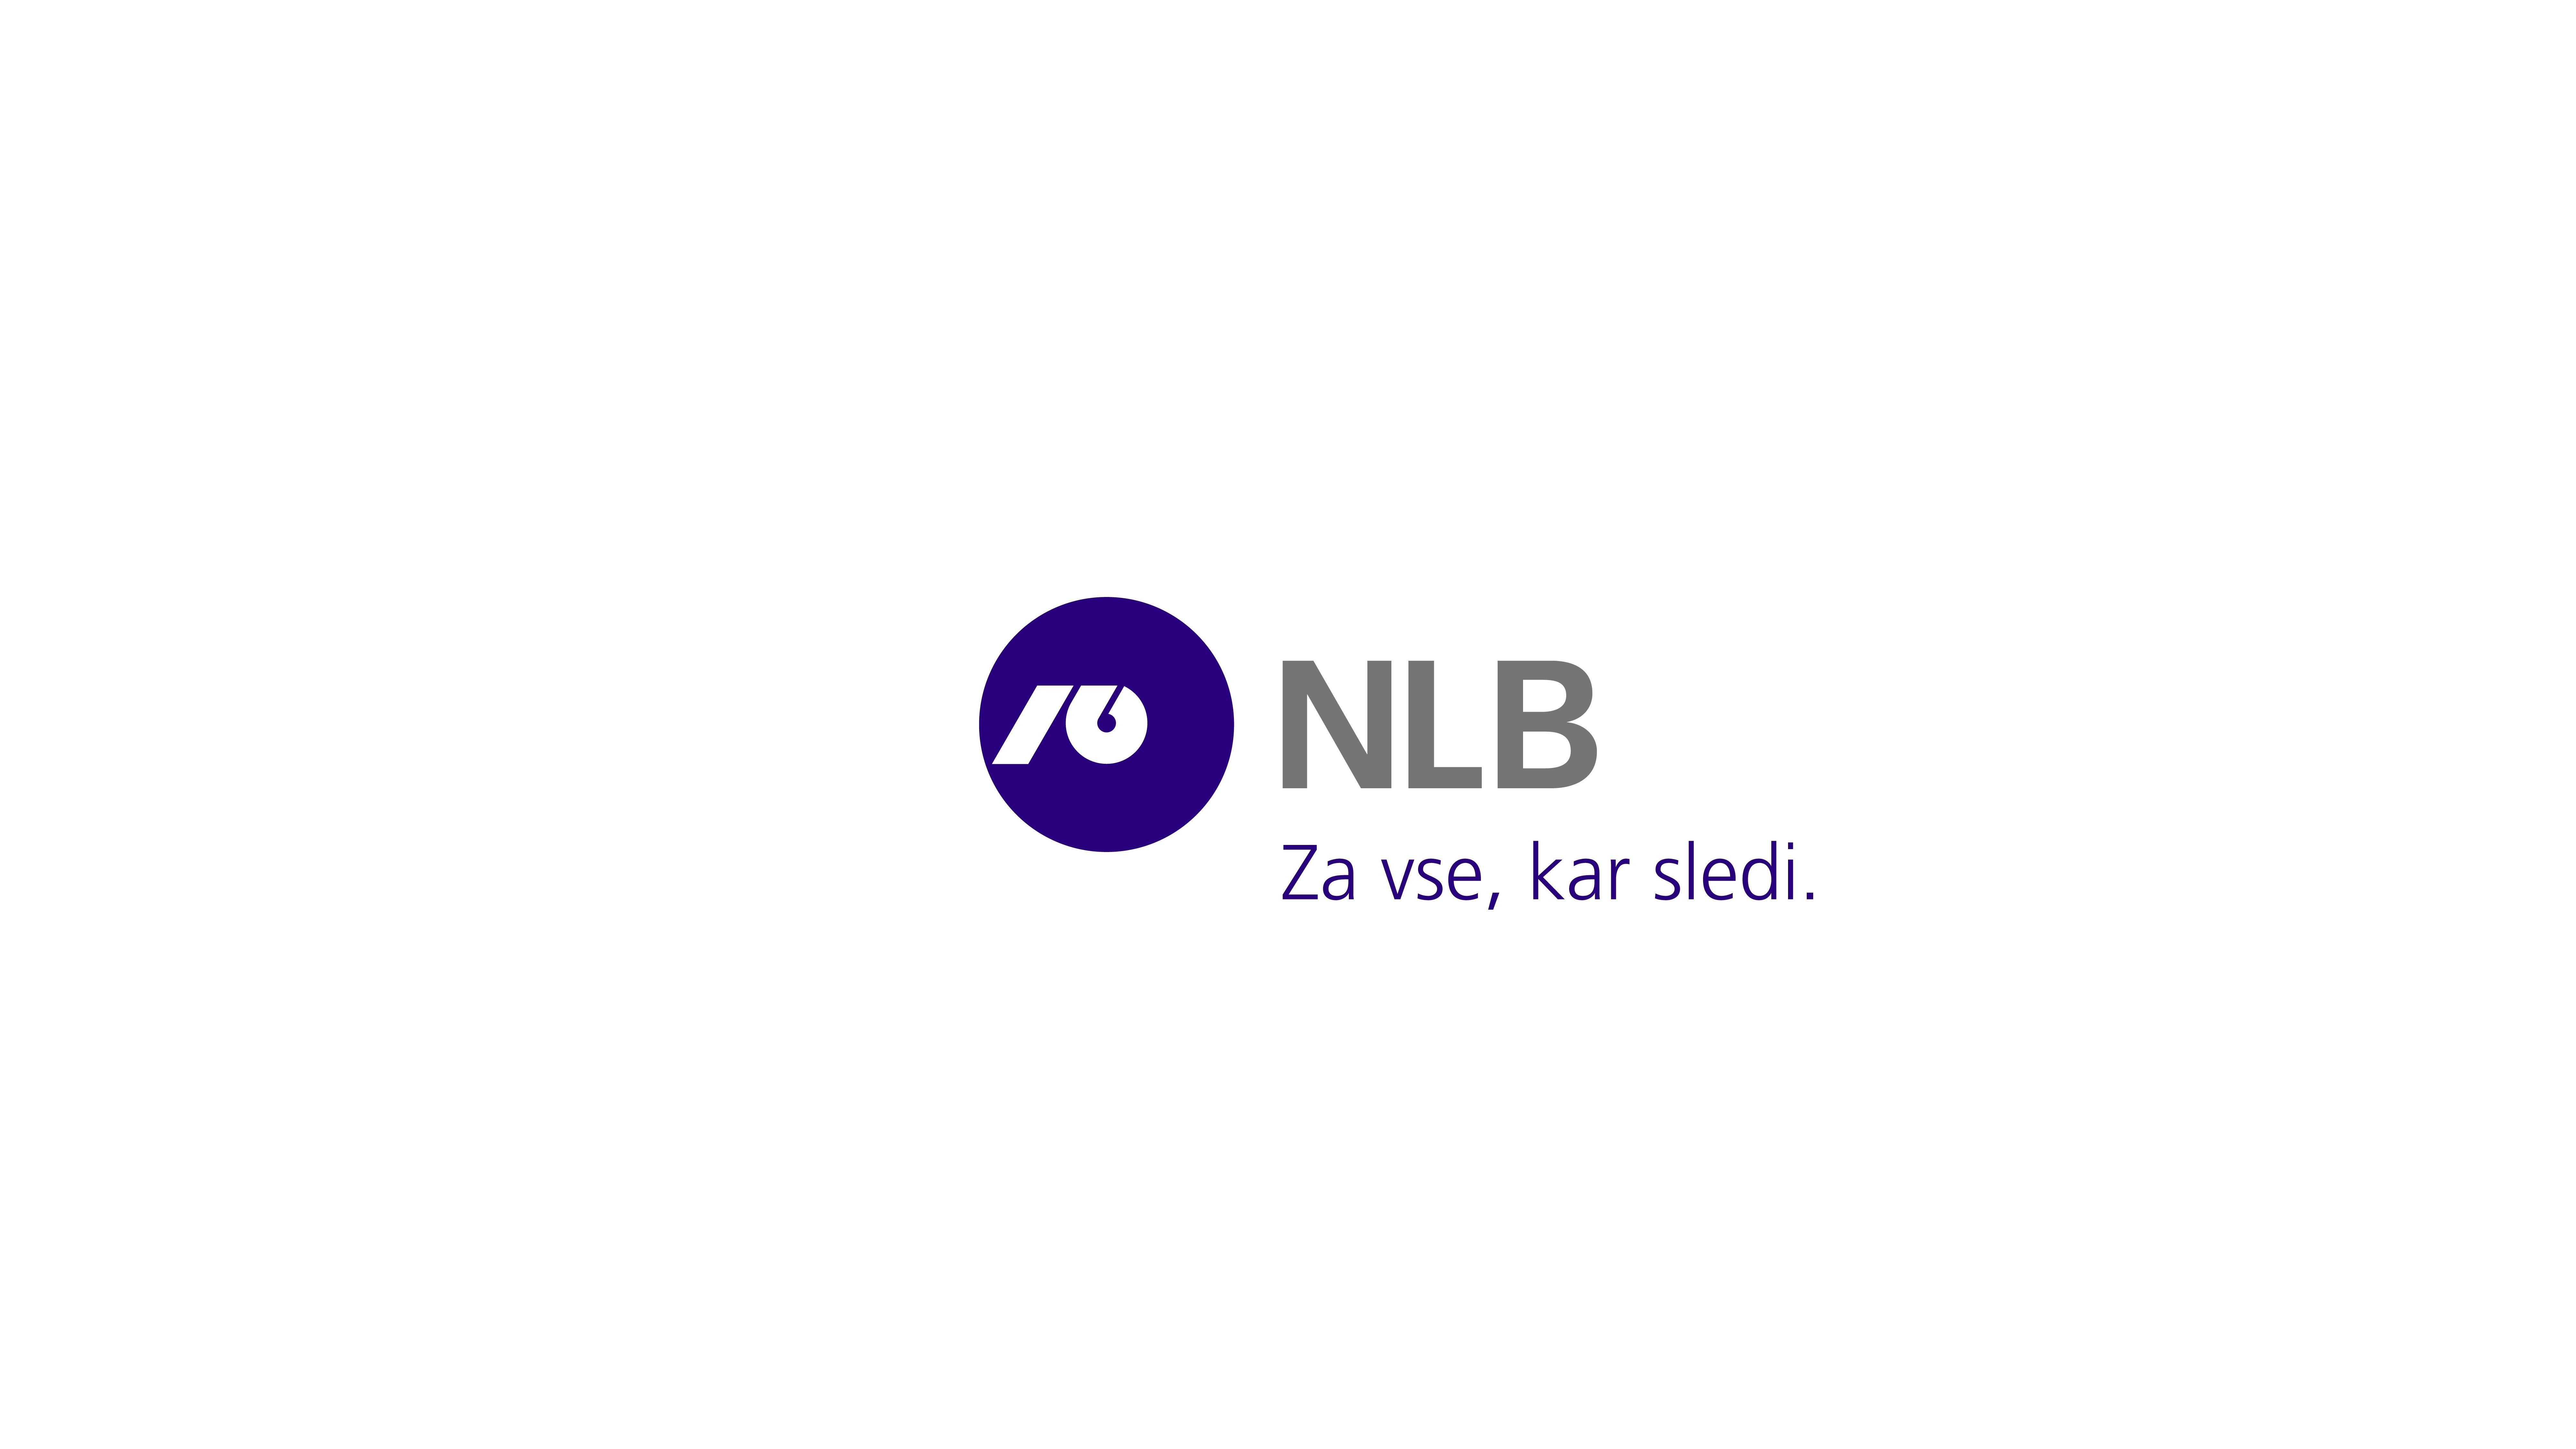 2_nlb-logo-super.jpg